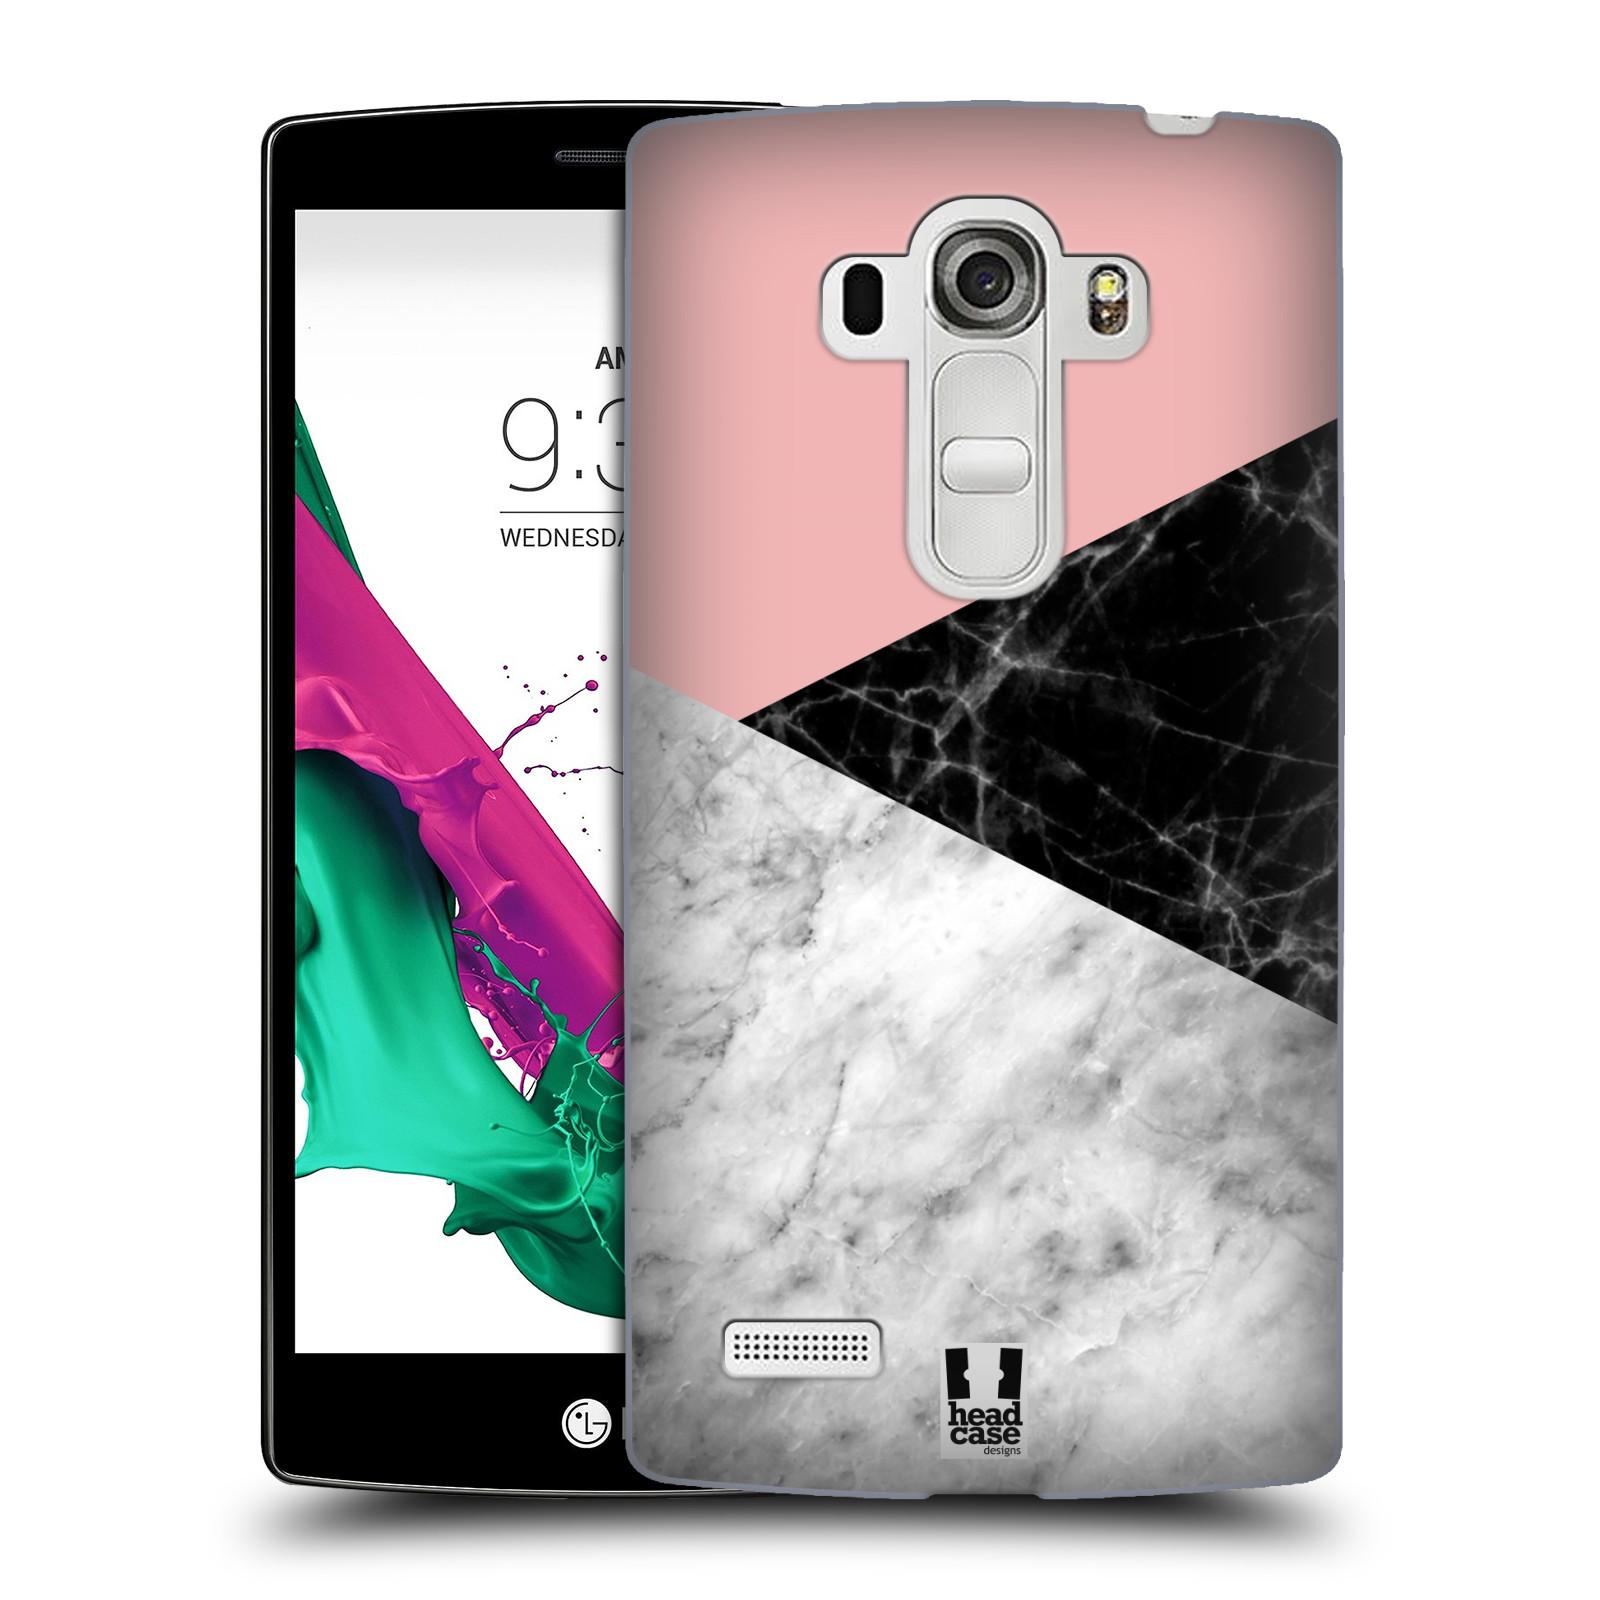 Plastové pouzdro na mobil LG G4s - Head Case - Mramor mix